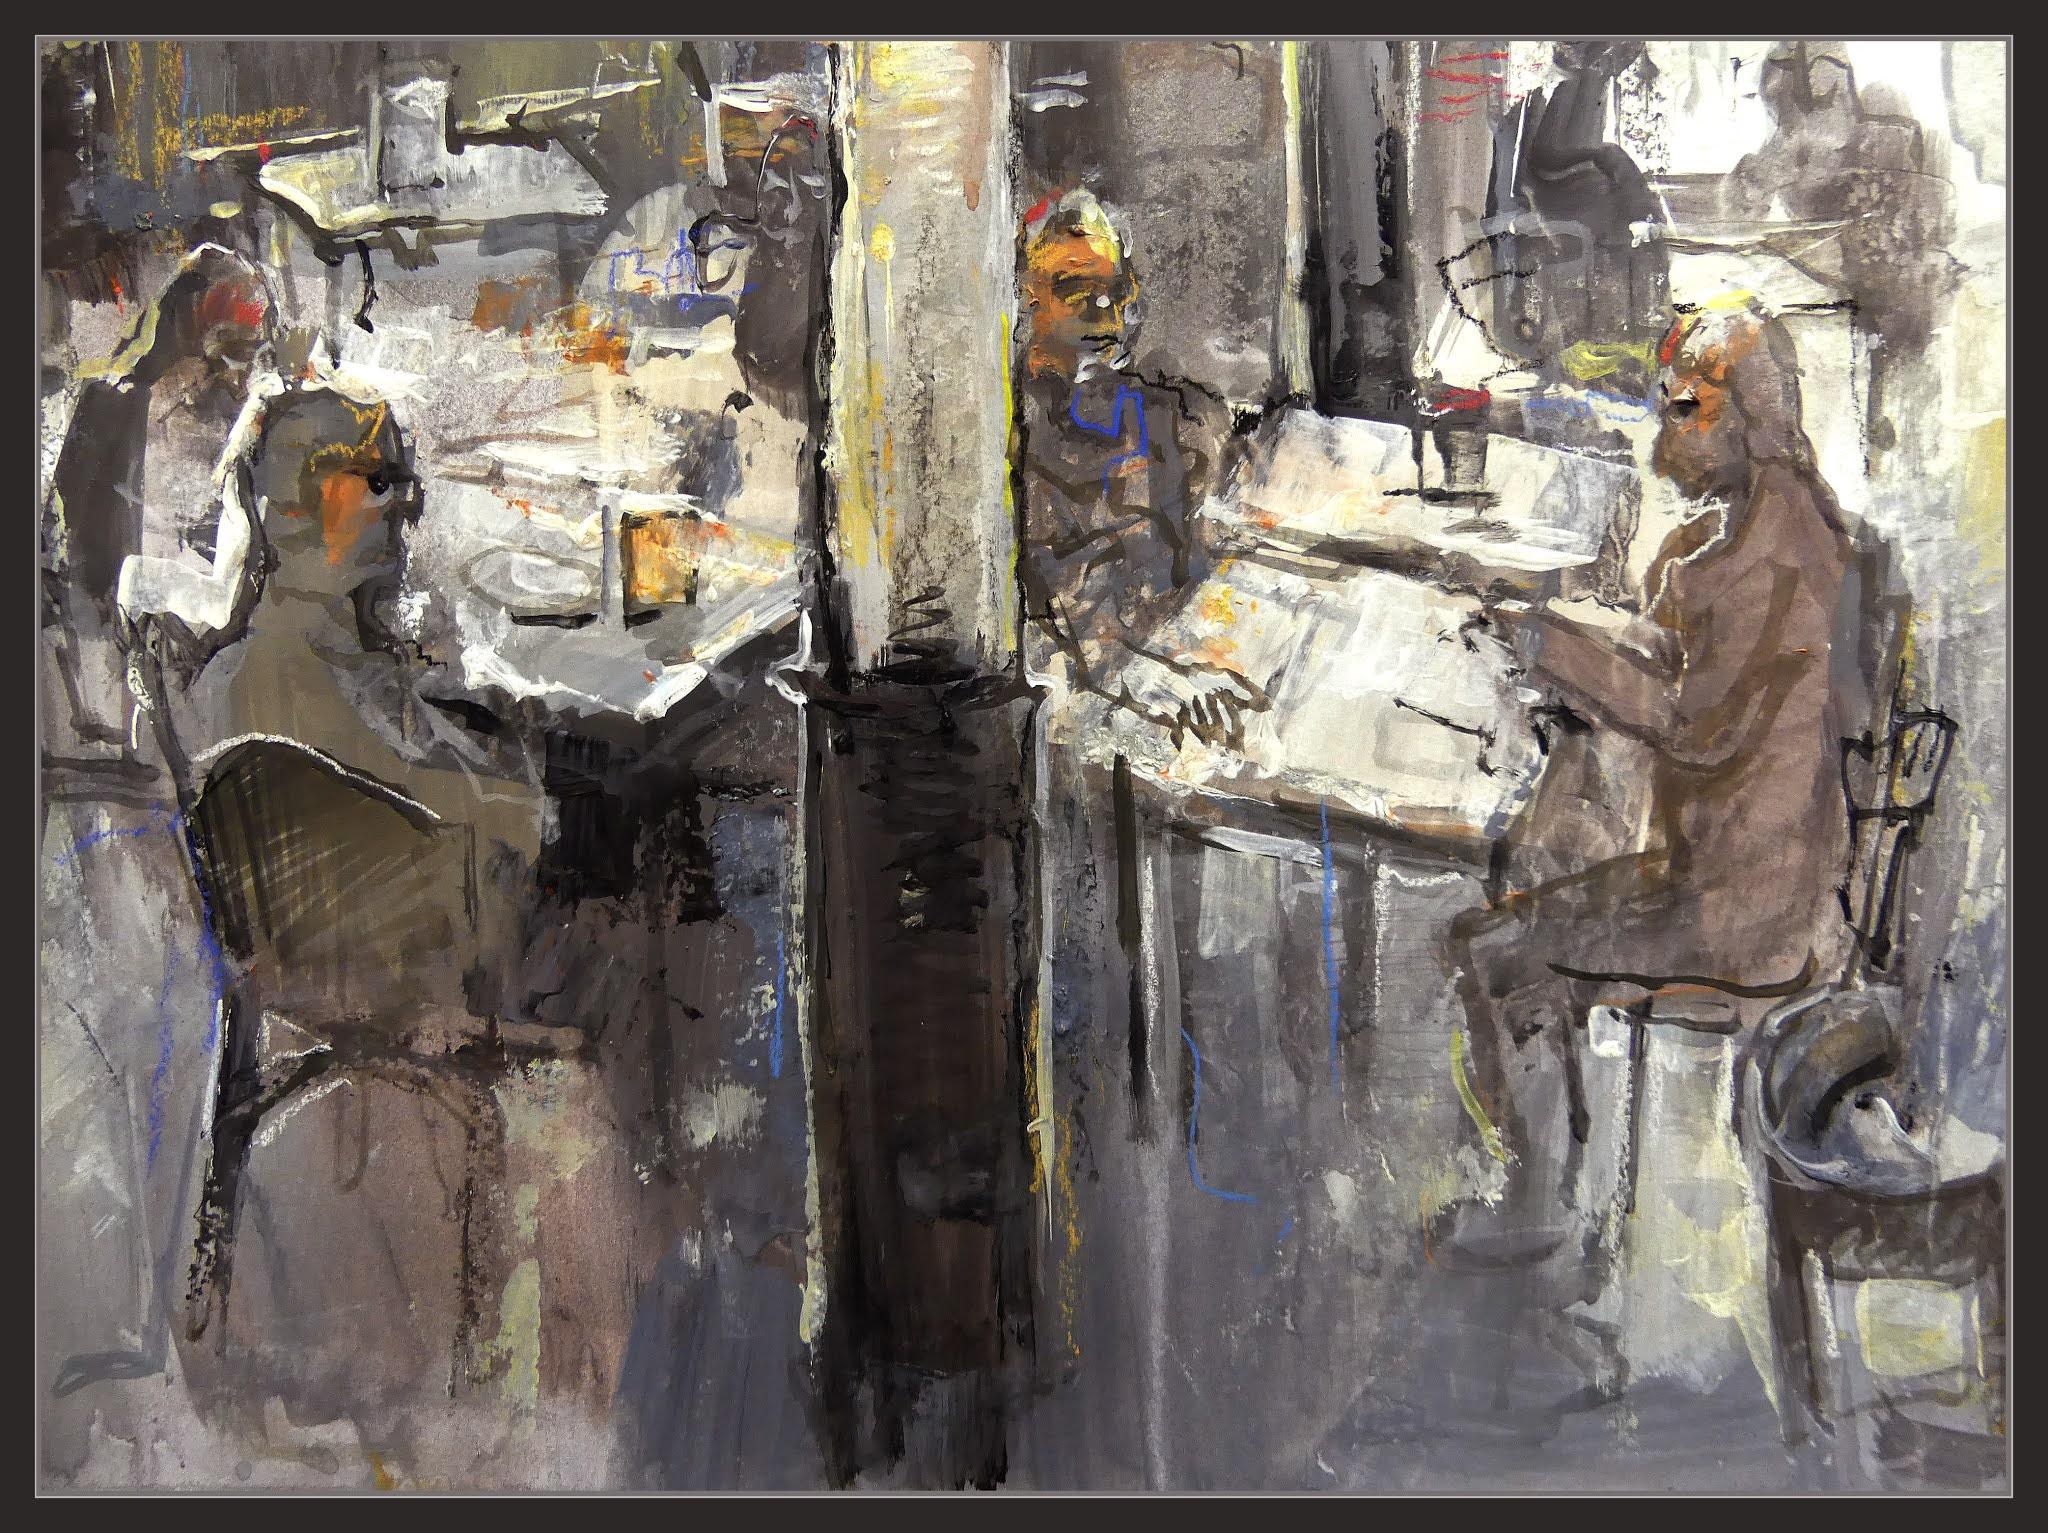 CAFE ZURICH-PINTURA-BARCELONA-ART-INTERIORS-CAFETERIES-DETALLS-PERSONES-PINTURES-ARTISTA-PINTOR-ERNEST DESCALS-